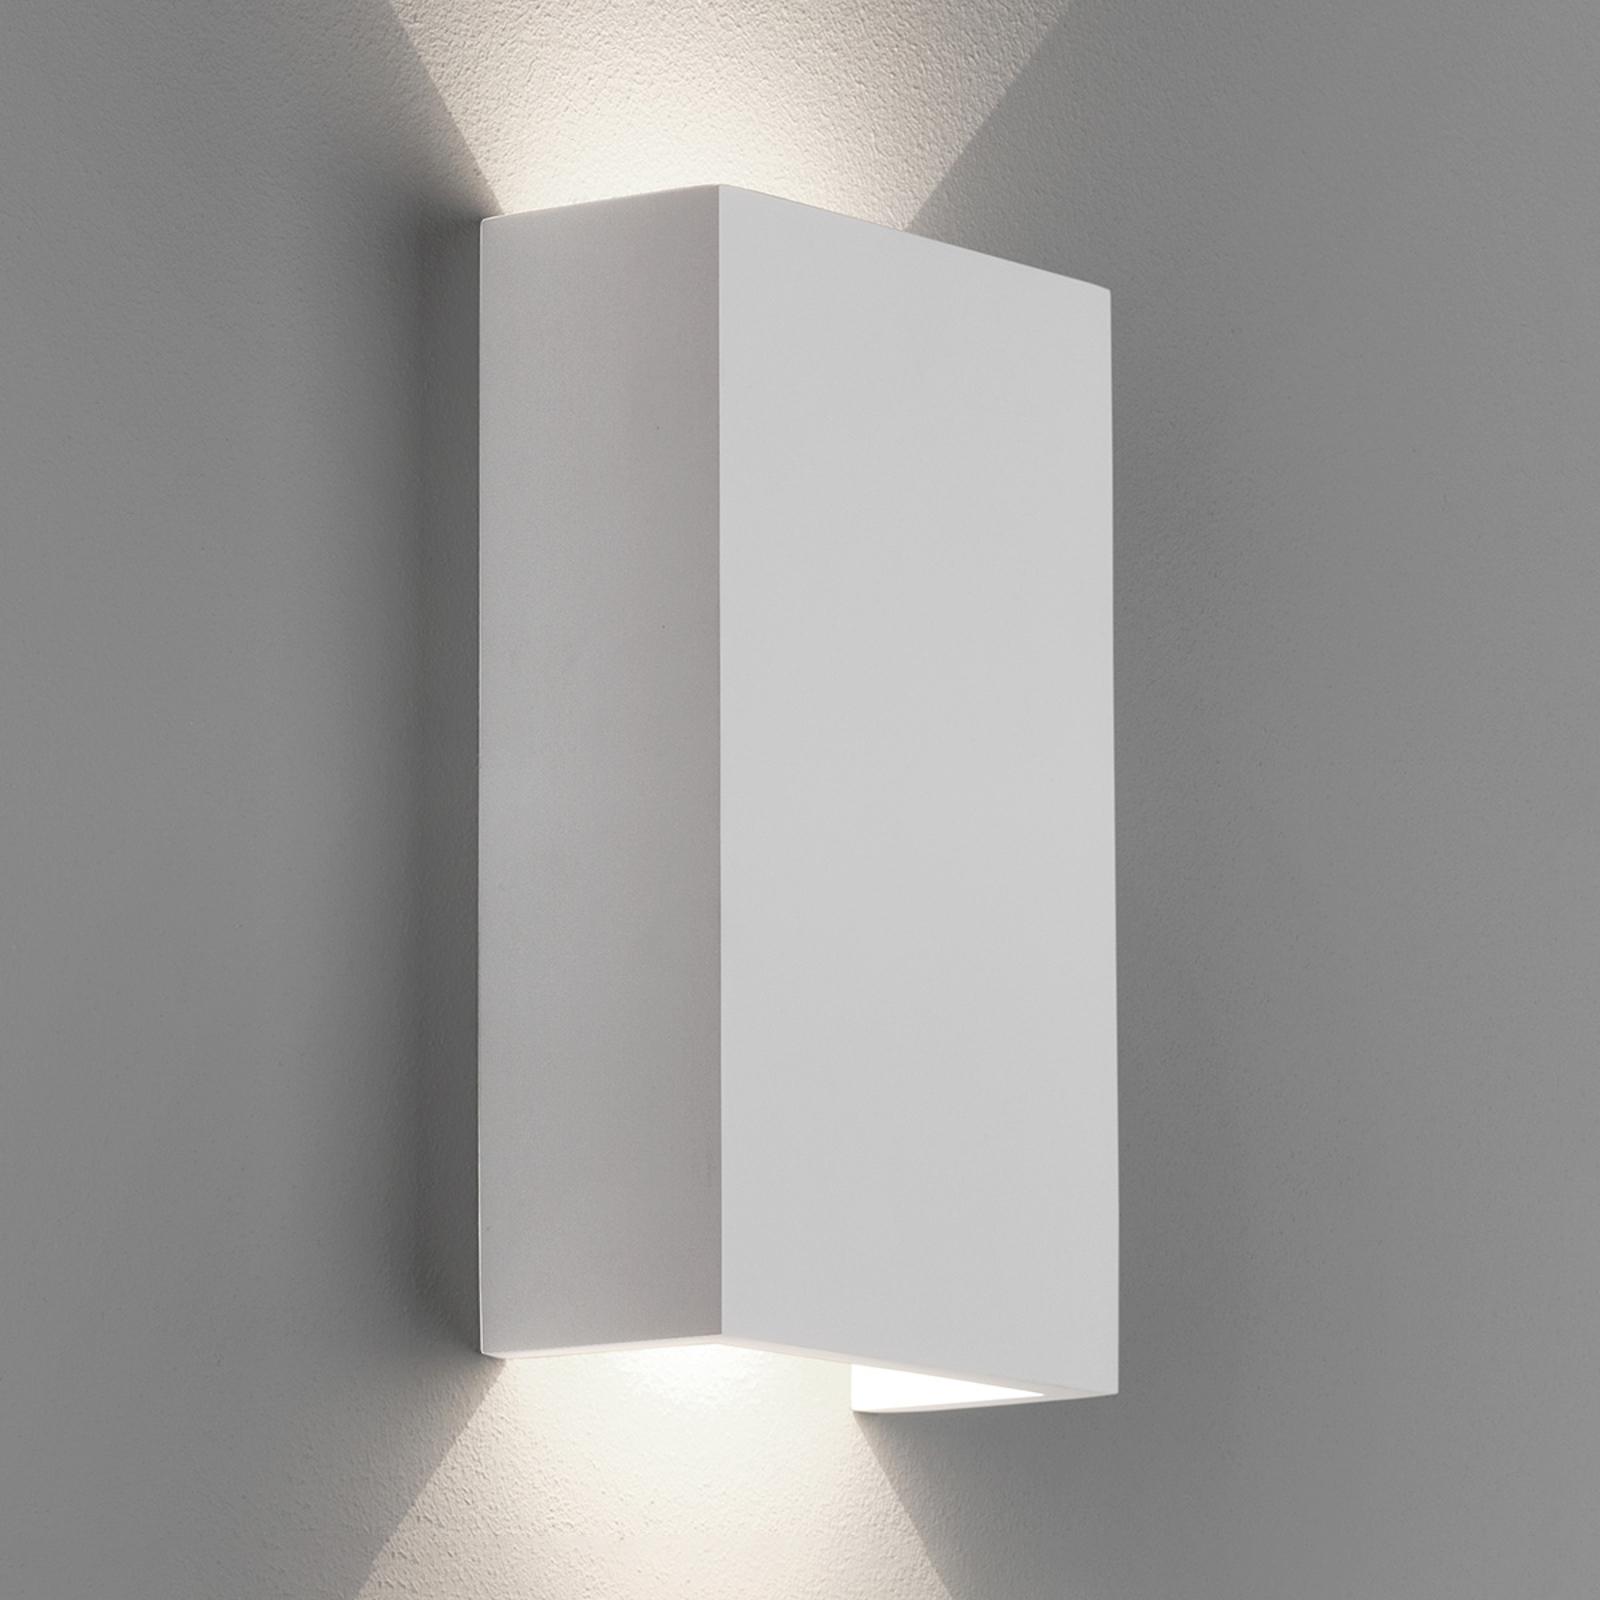 Astro Rio 125 applique plâtre LED, 2700K